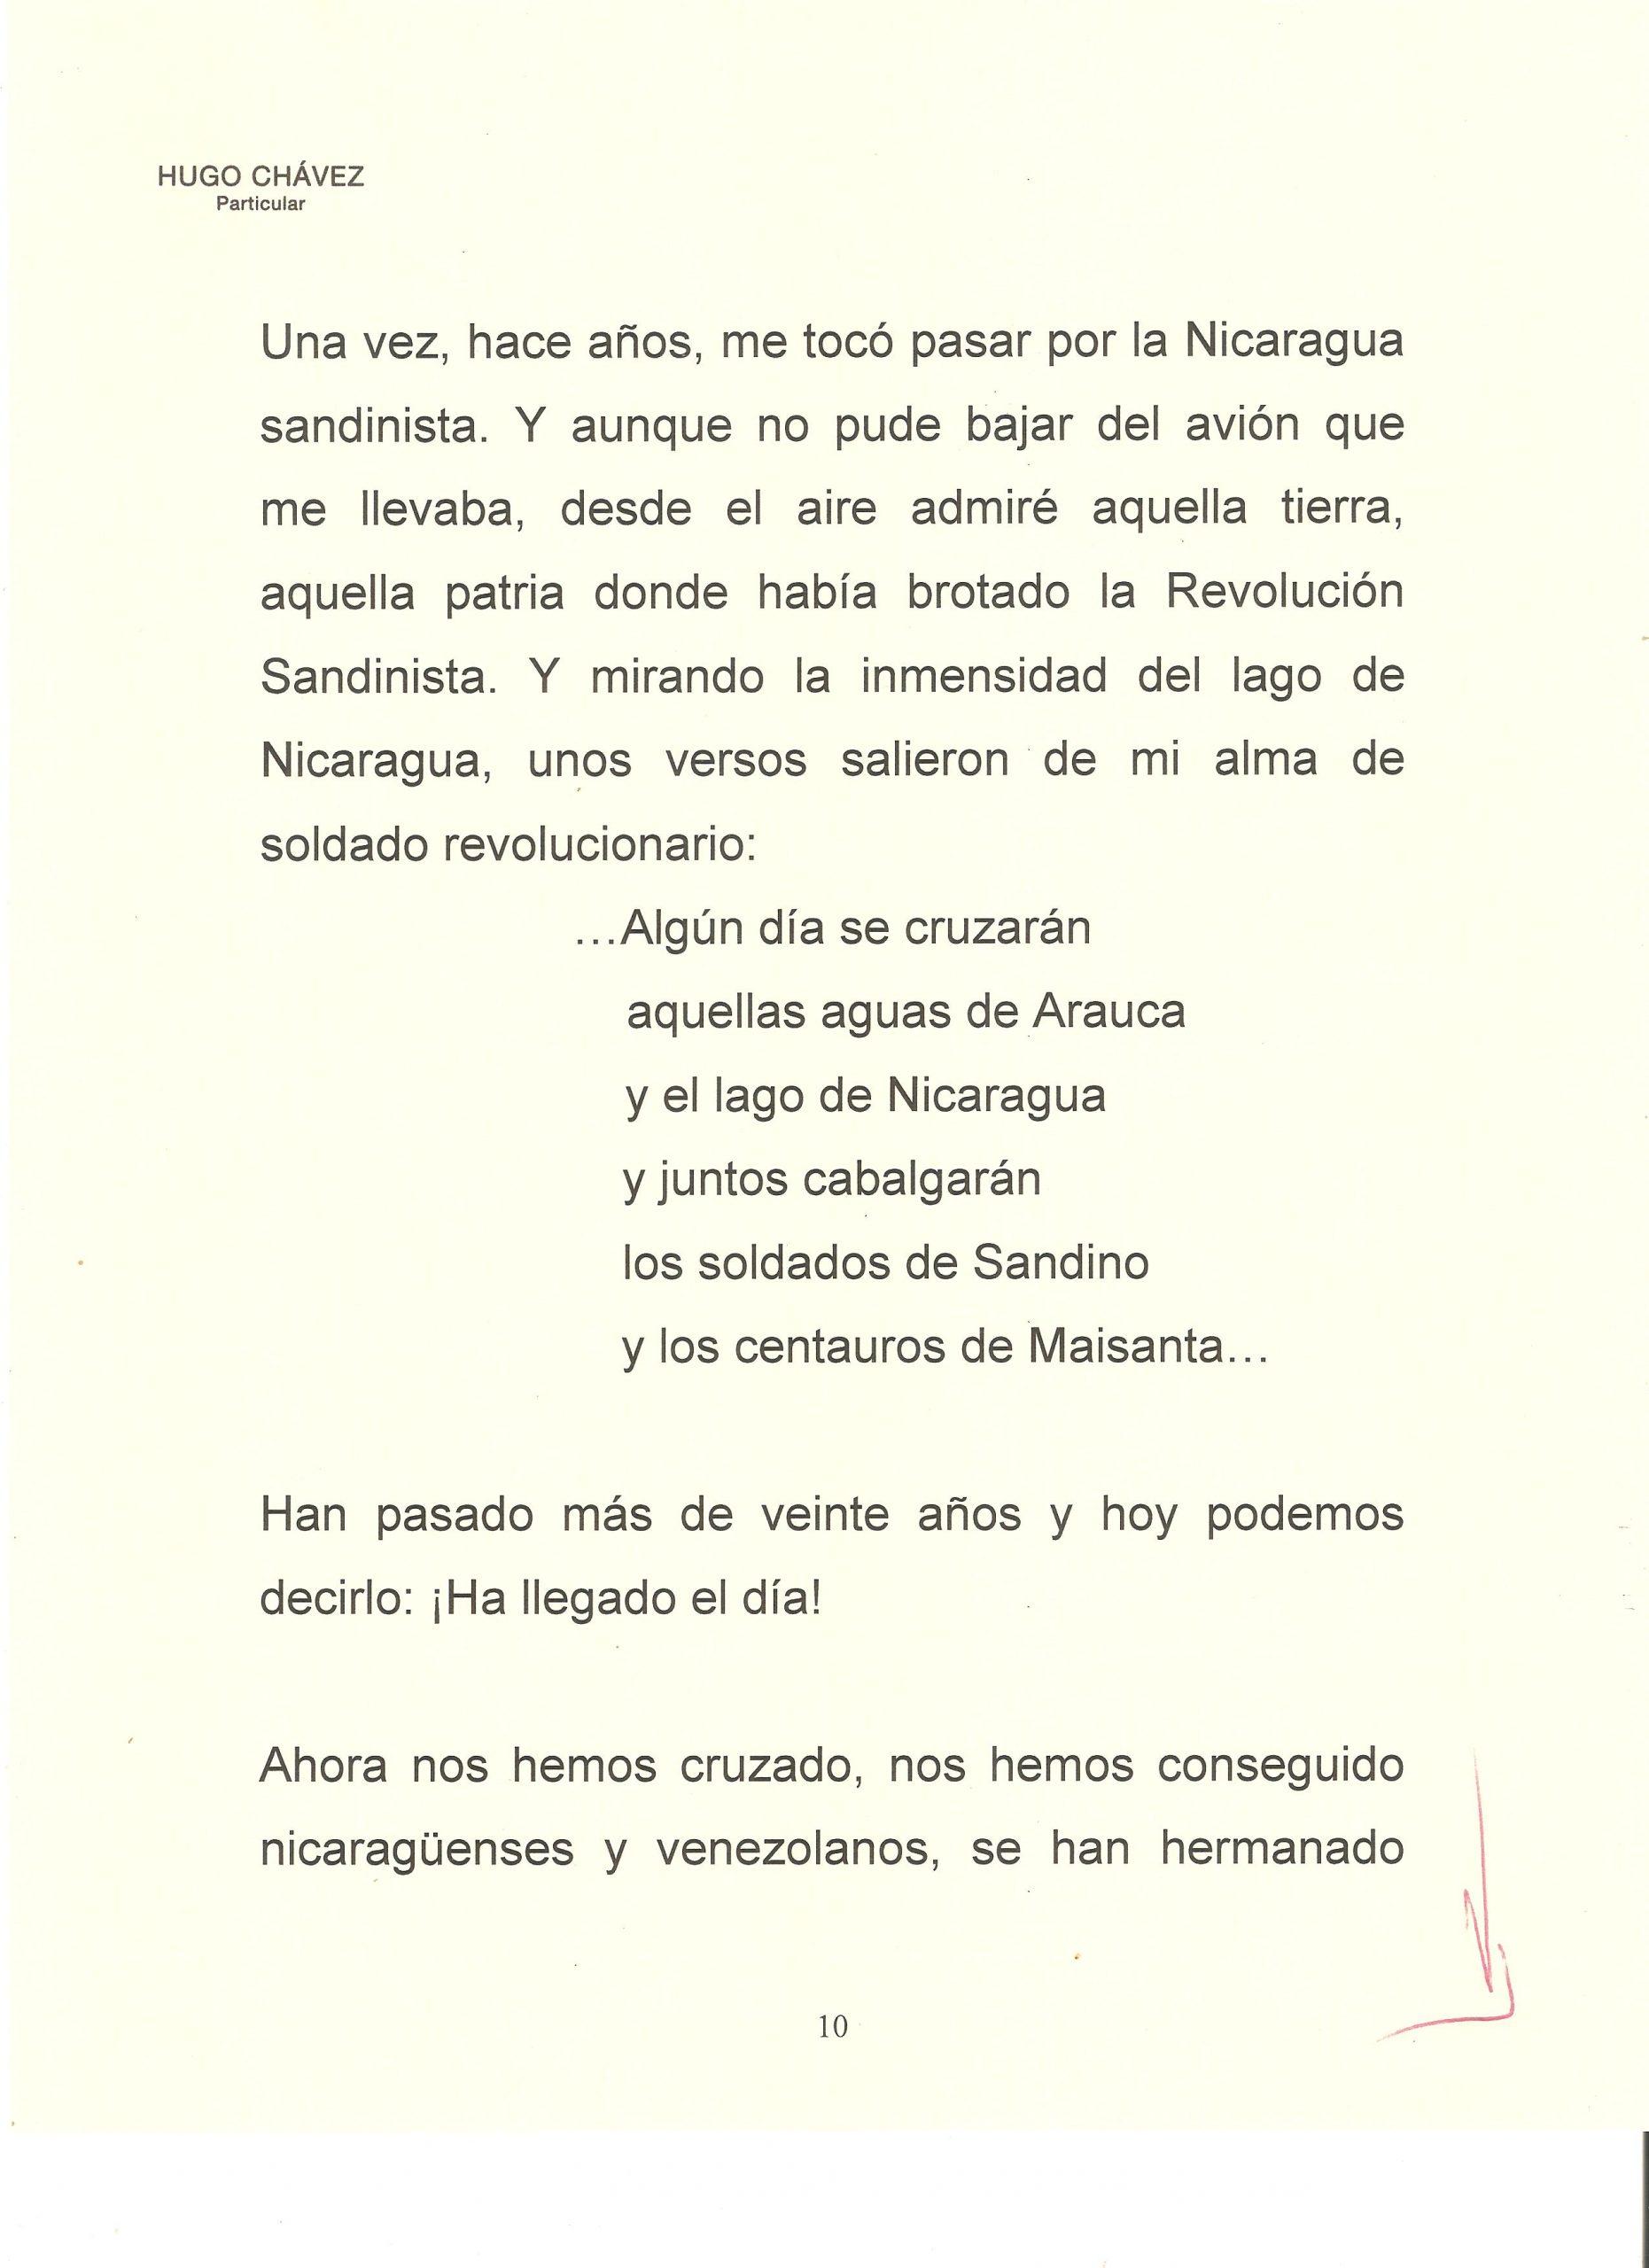 PROLOGO DE HUGO CHAVEZ A WALTER 10